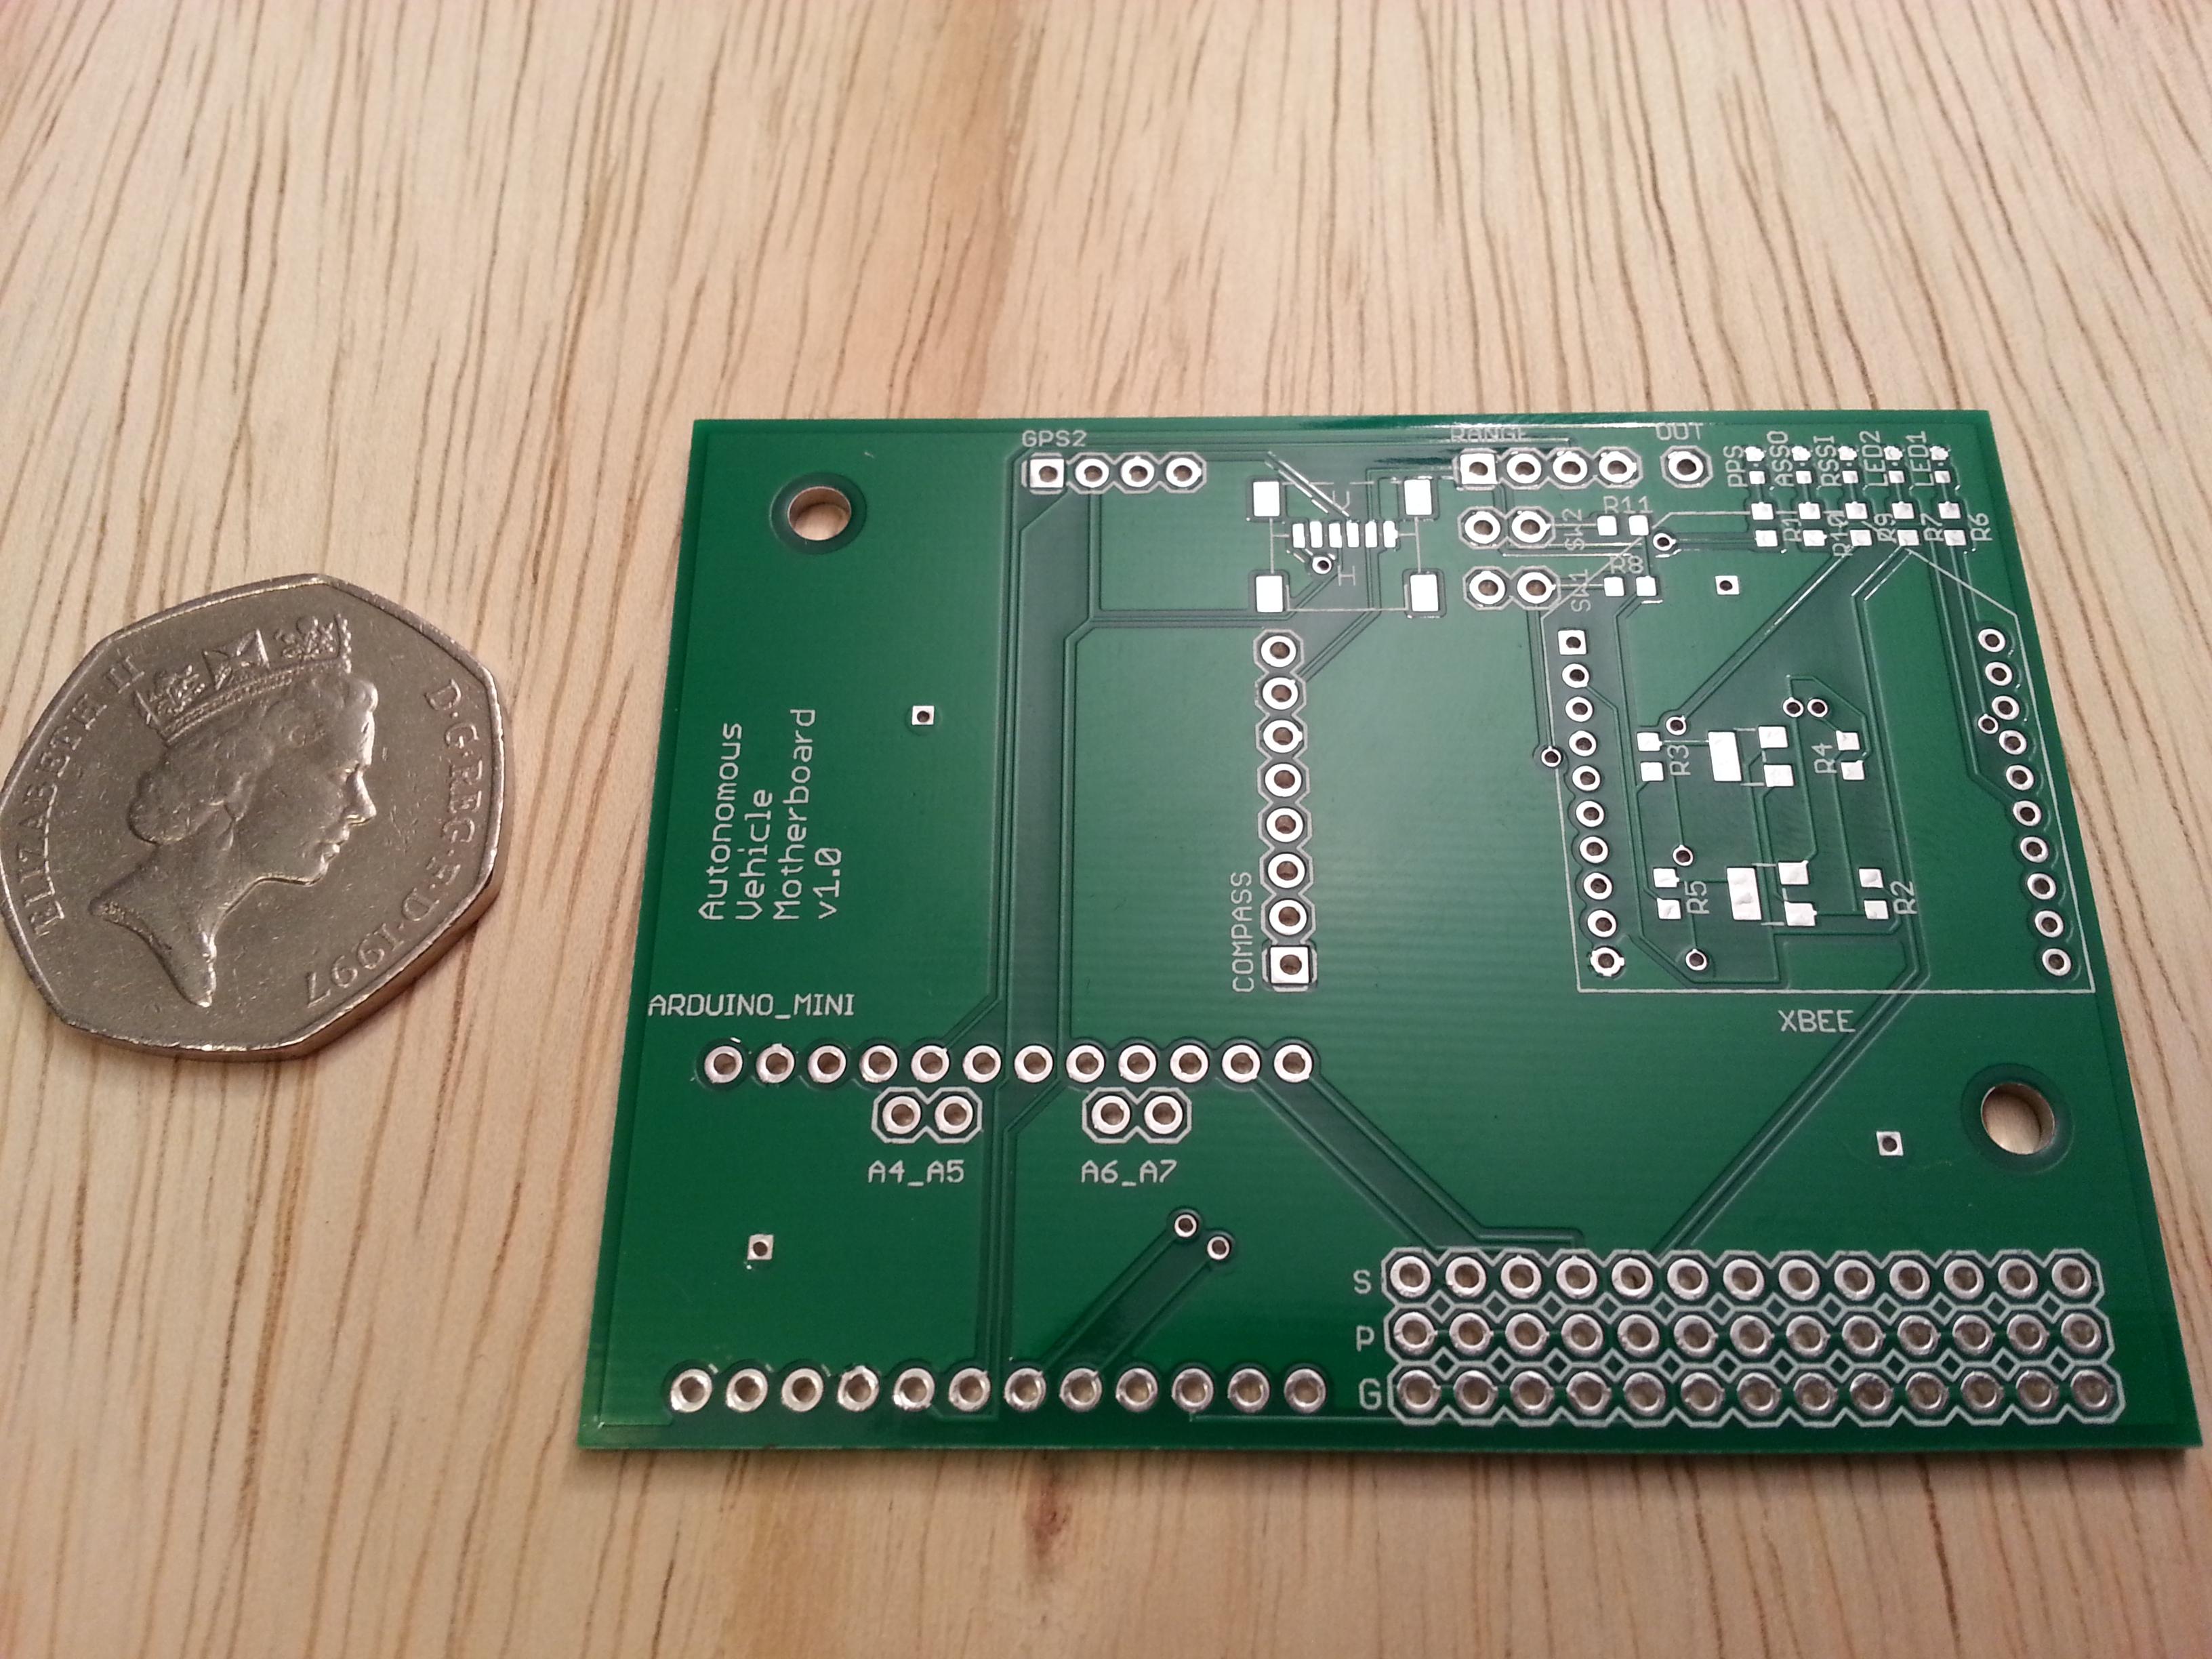 Adding Custom Boards To The Arduino V1: Autonomous Vehicle